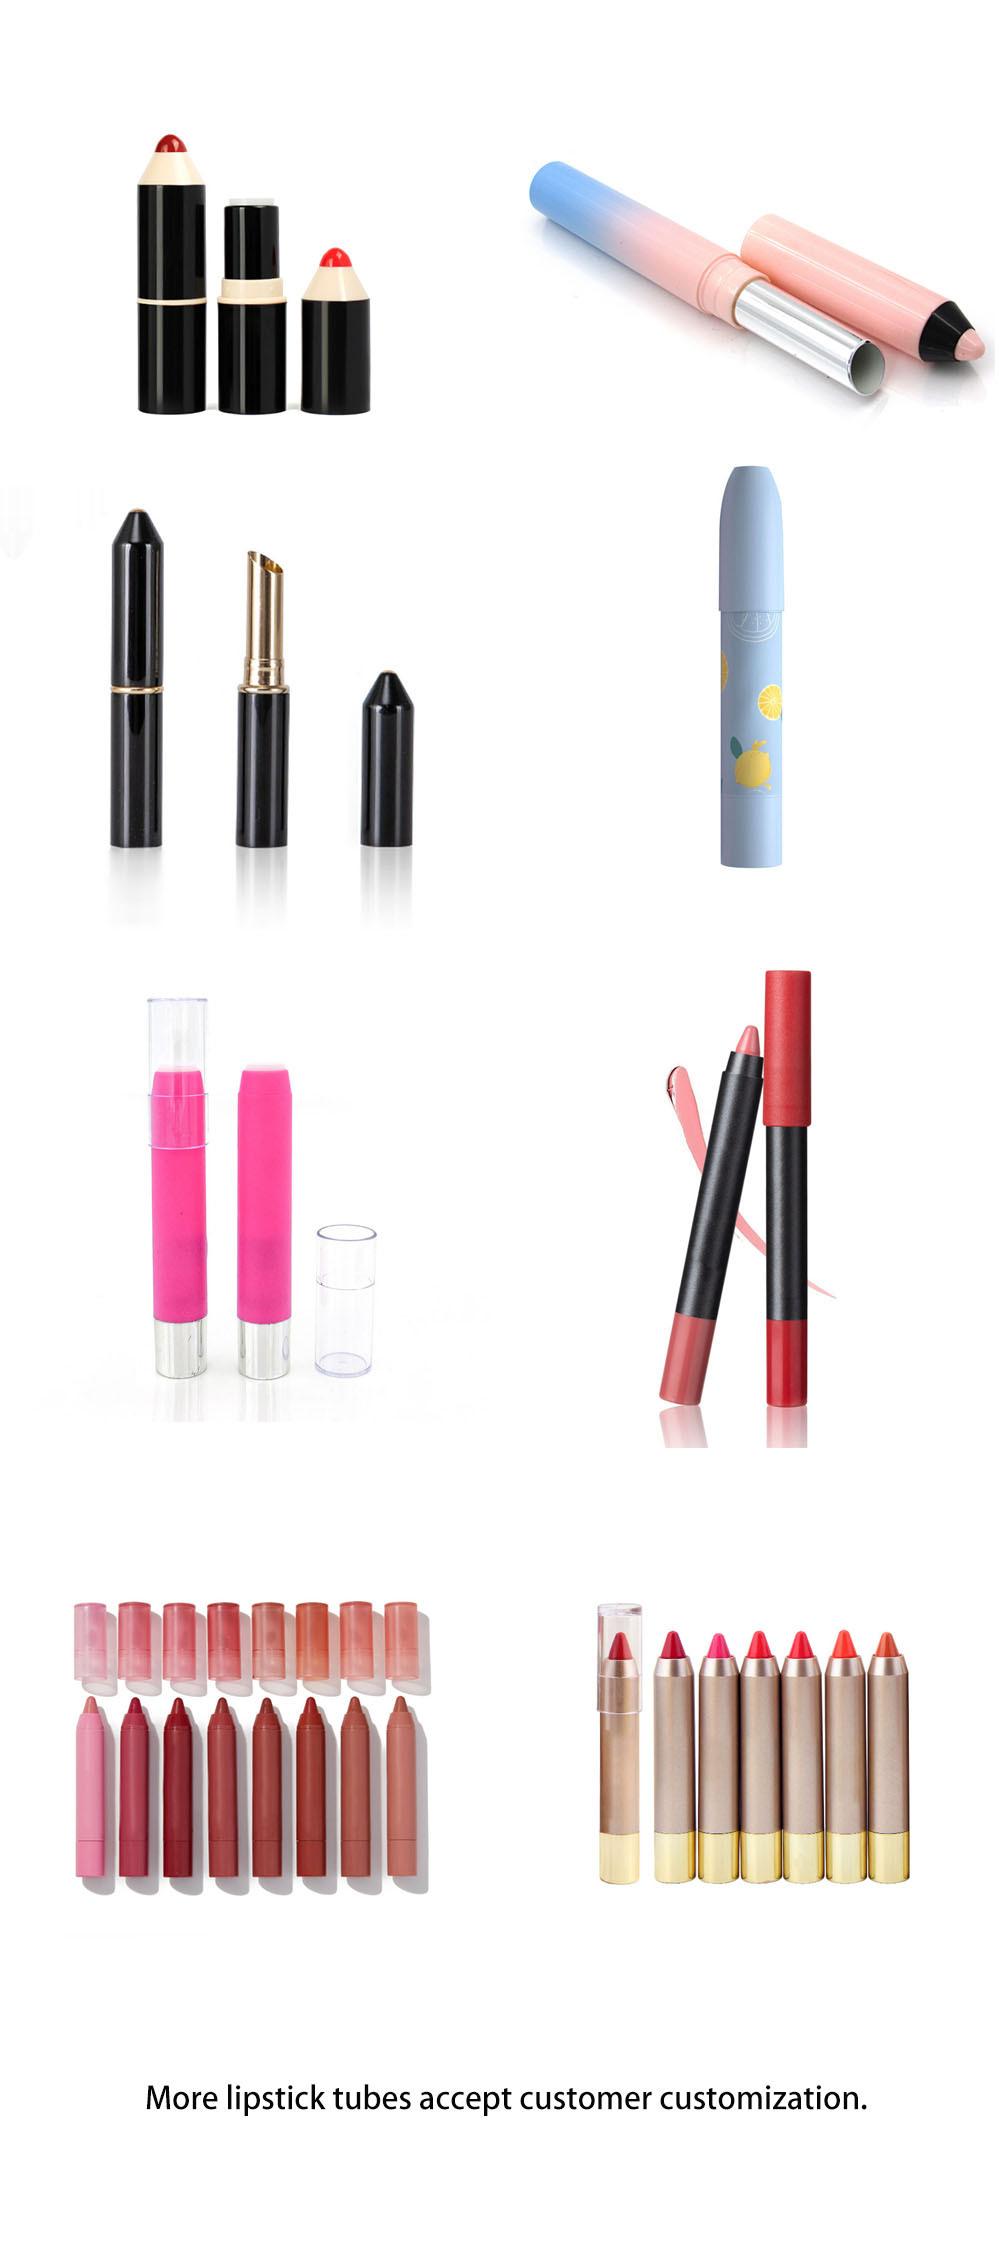 Moisturizing crayon lipstick tube